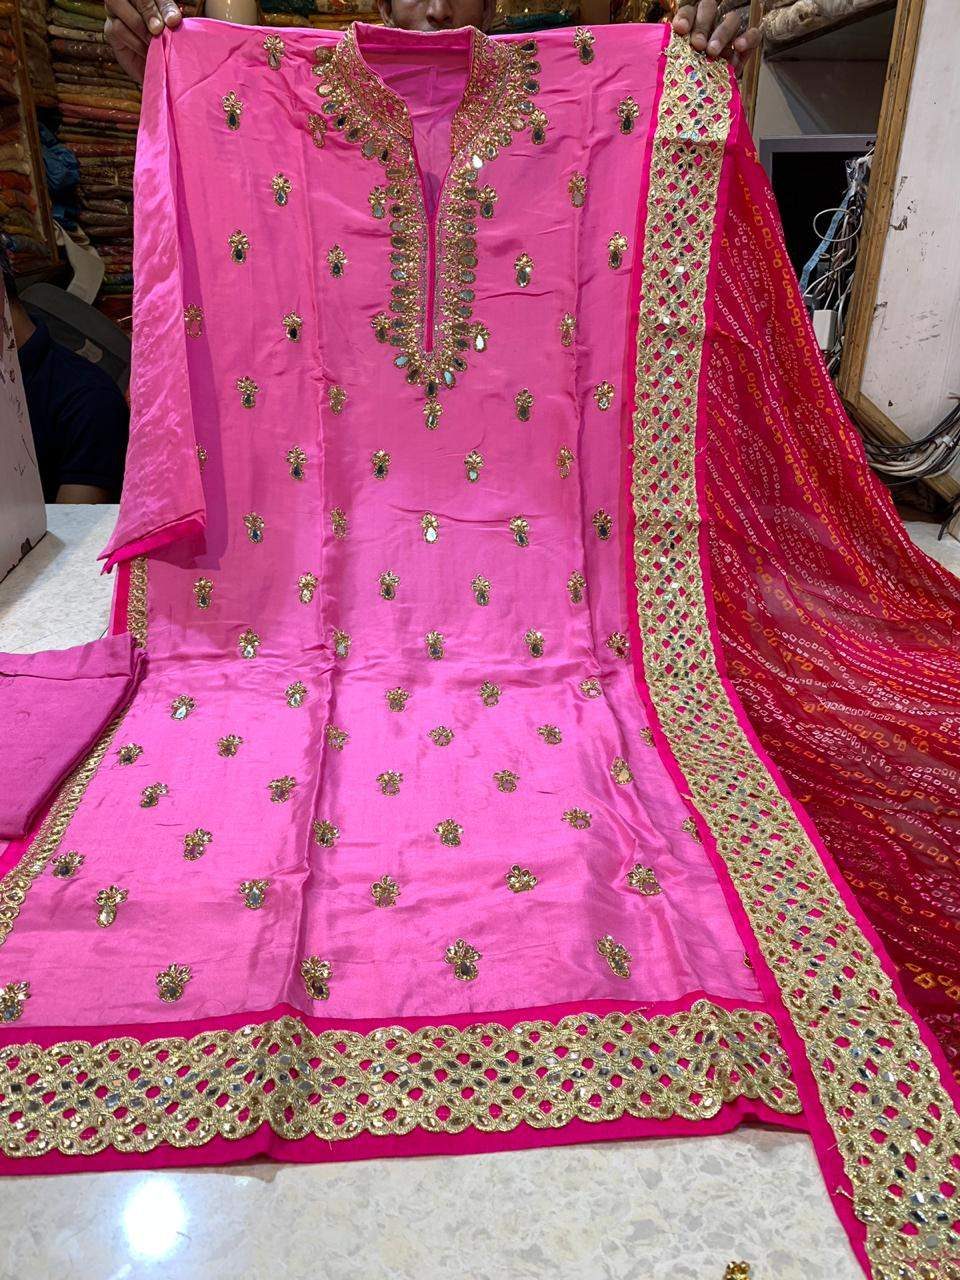 69e4885e451 Top 100 Ladies Readymade Garment Wholesalers in Kalyan City - Best ...